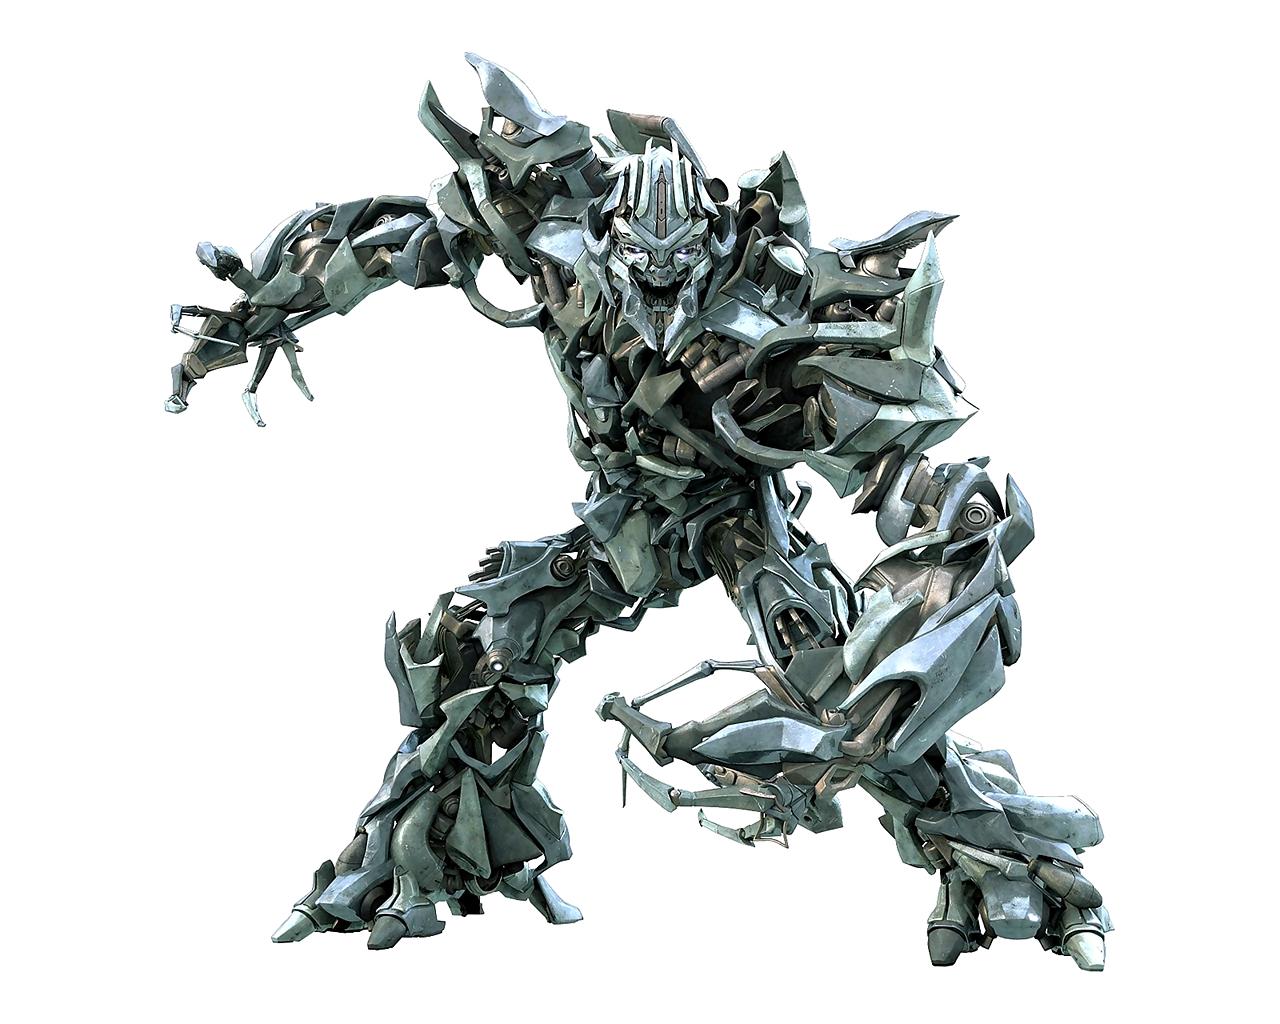 Megatron Transformers Film Series Monster Moviepedia